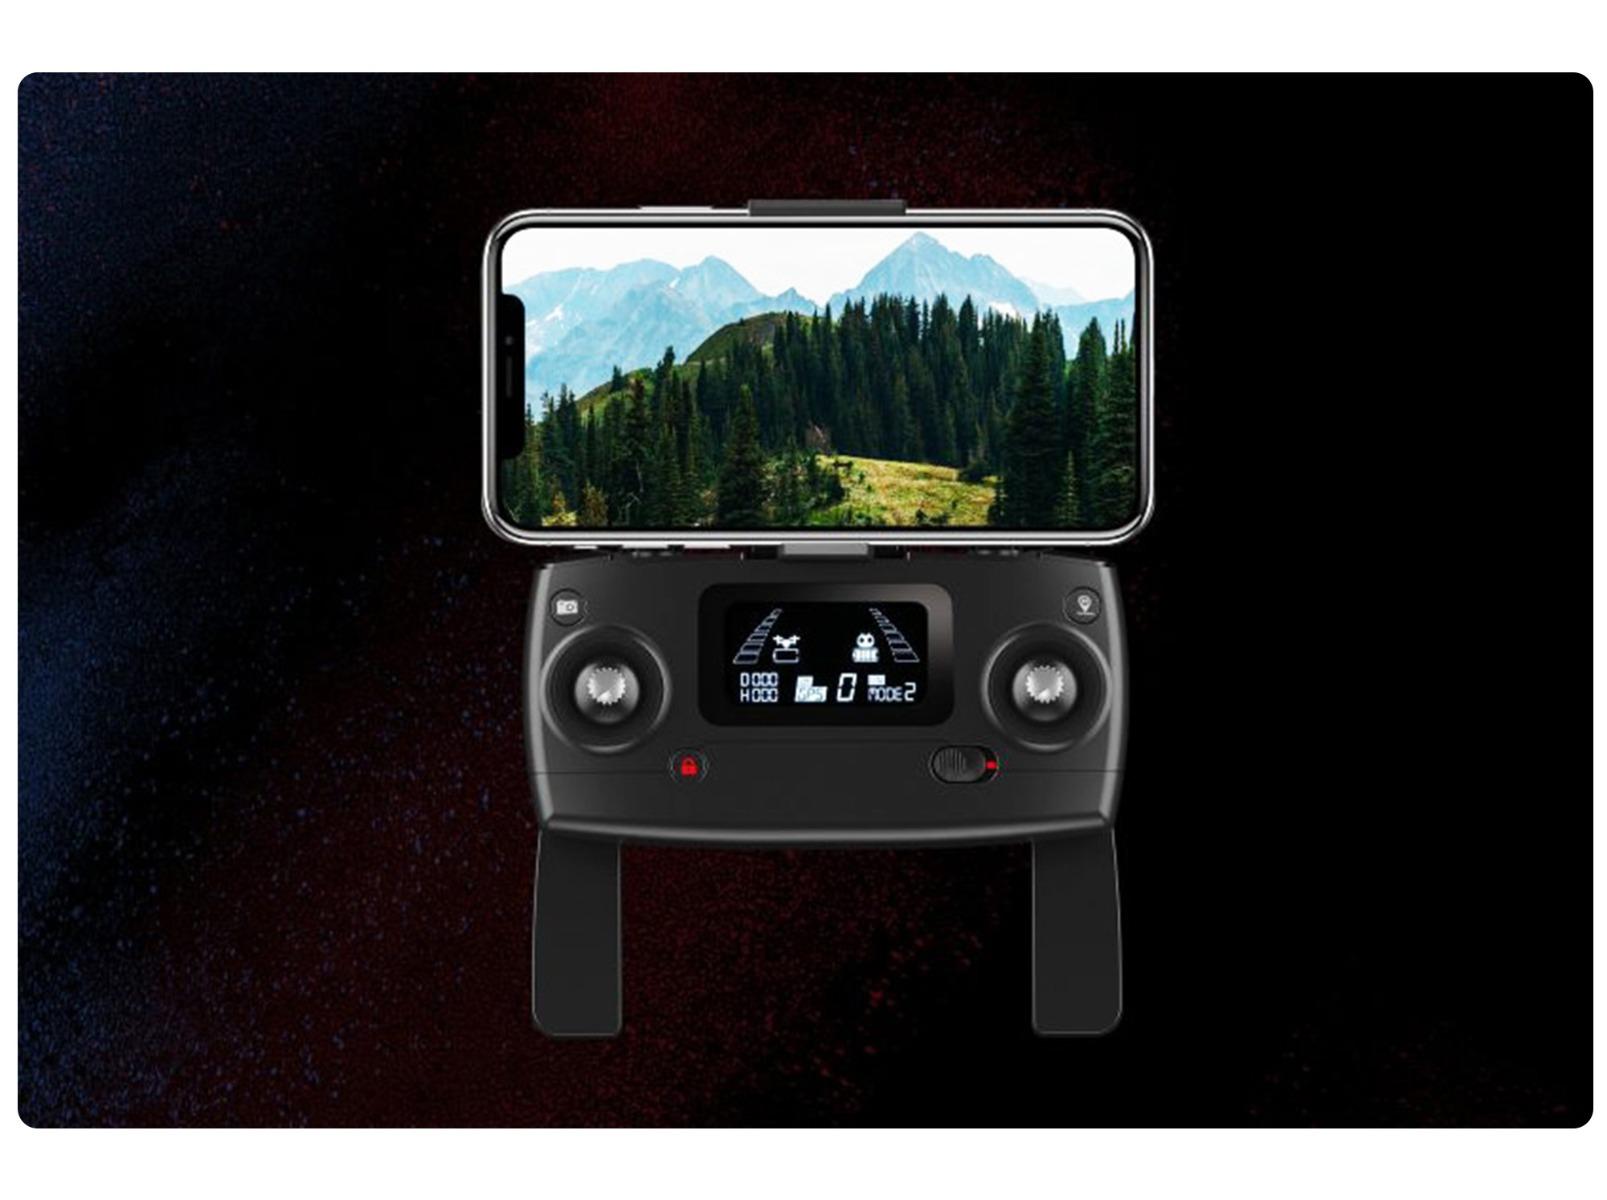 Dron Overmax X-bee Drone 9.5 GPS